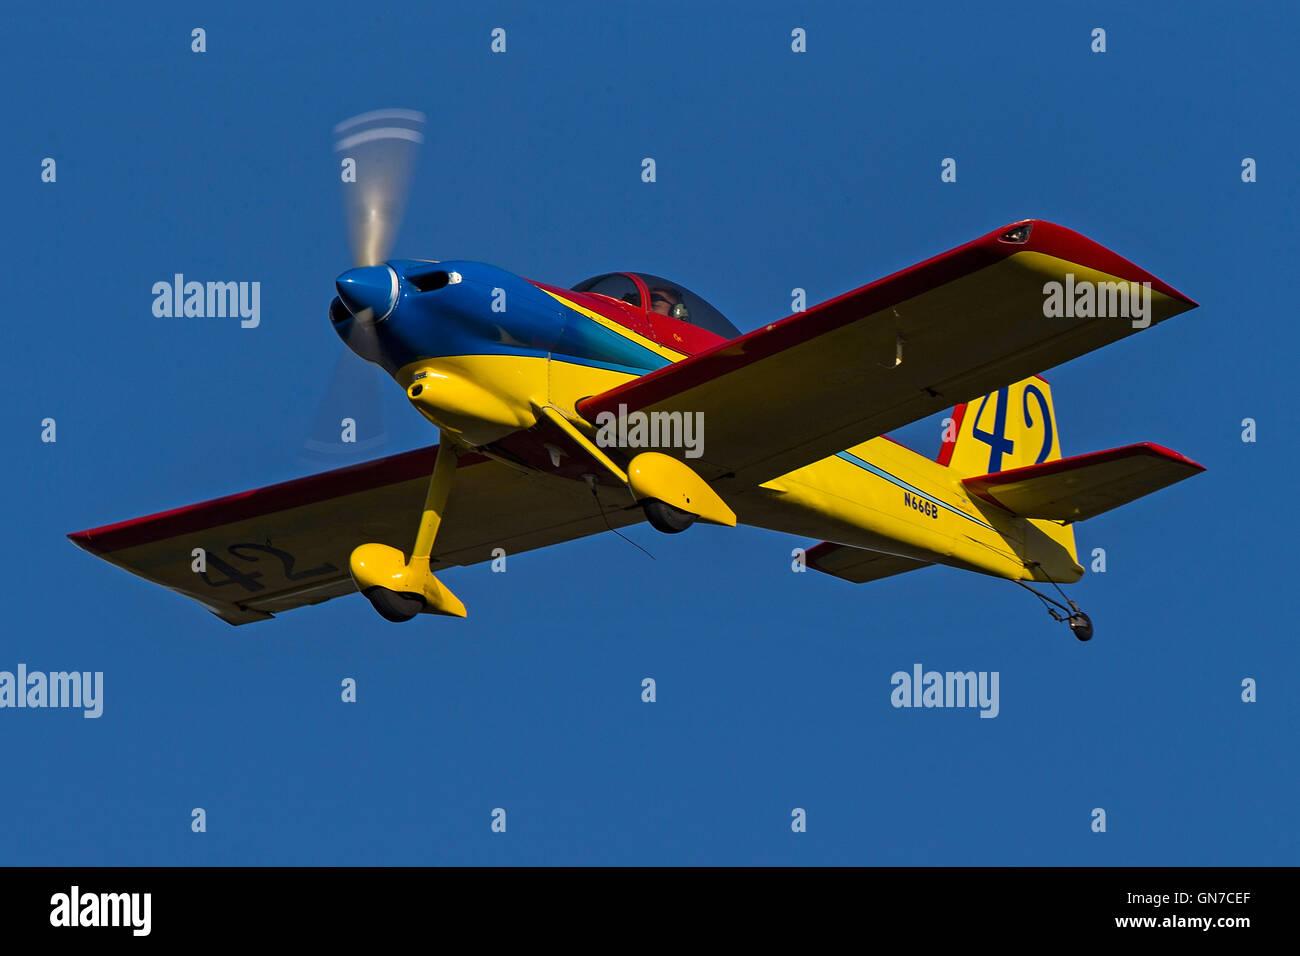 Van's Aircraft RV-3A (N66GB) lands at Palo Alto Airport (KPAO), Palo Alto, California, United States of America - Stock Image